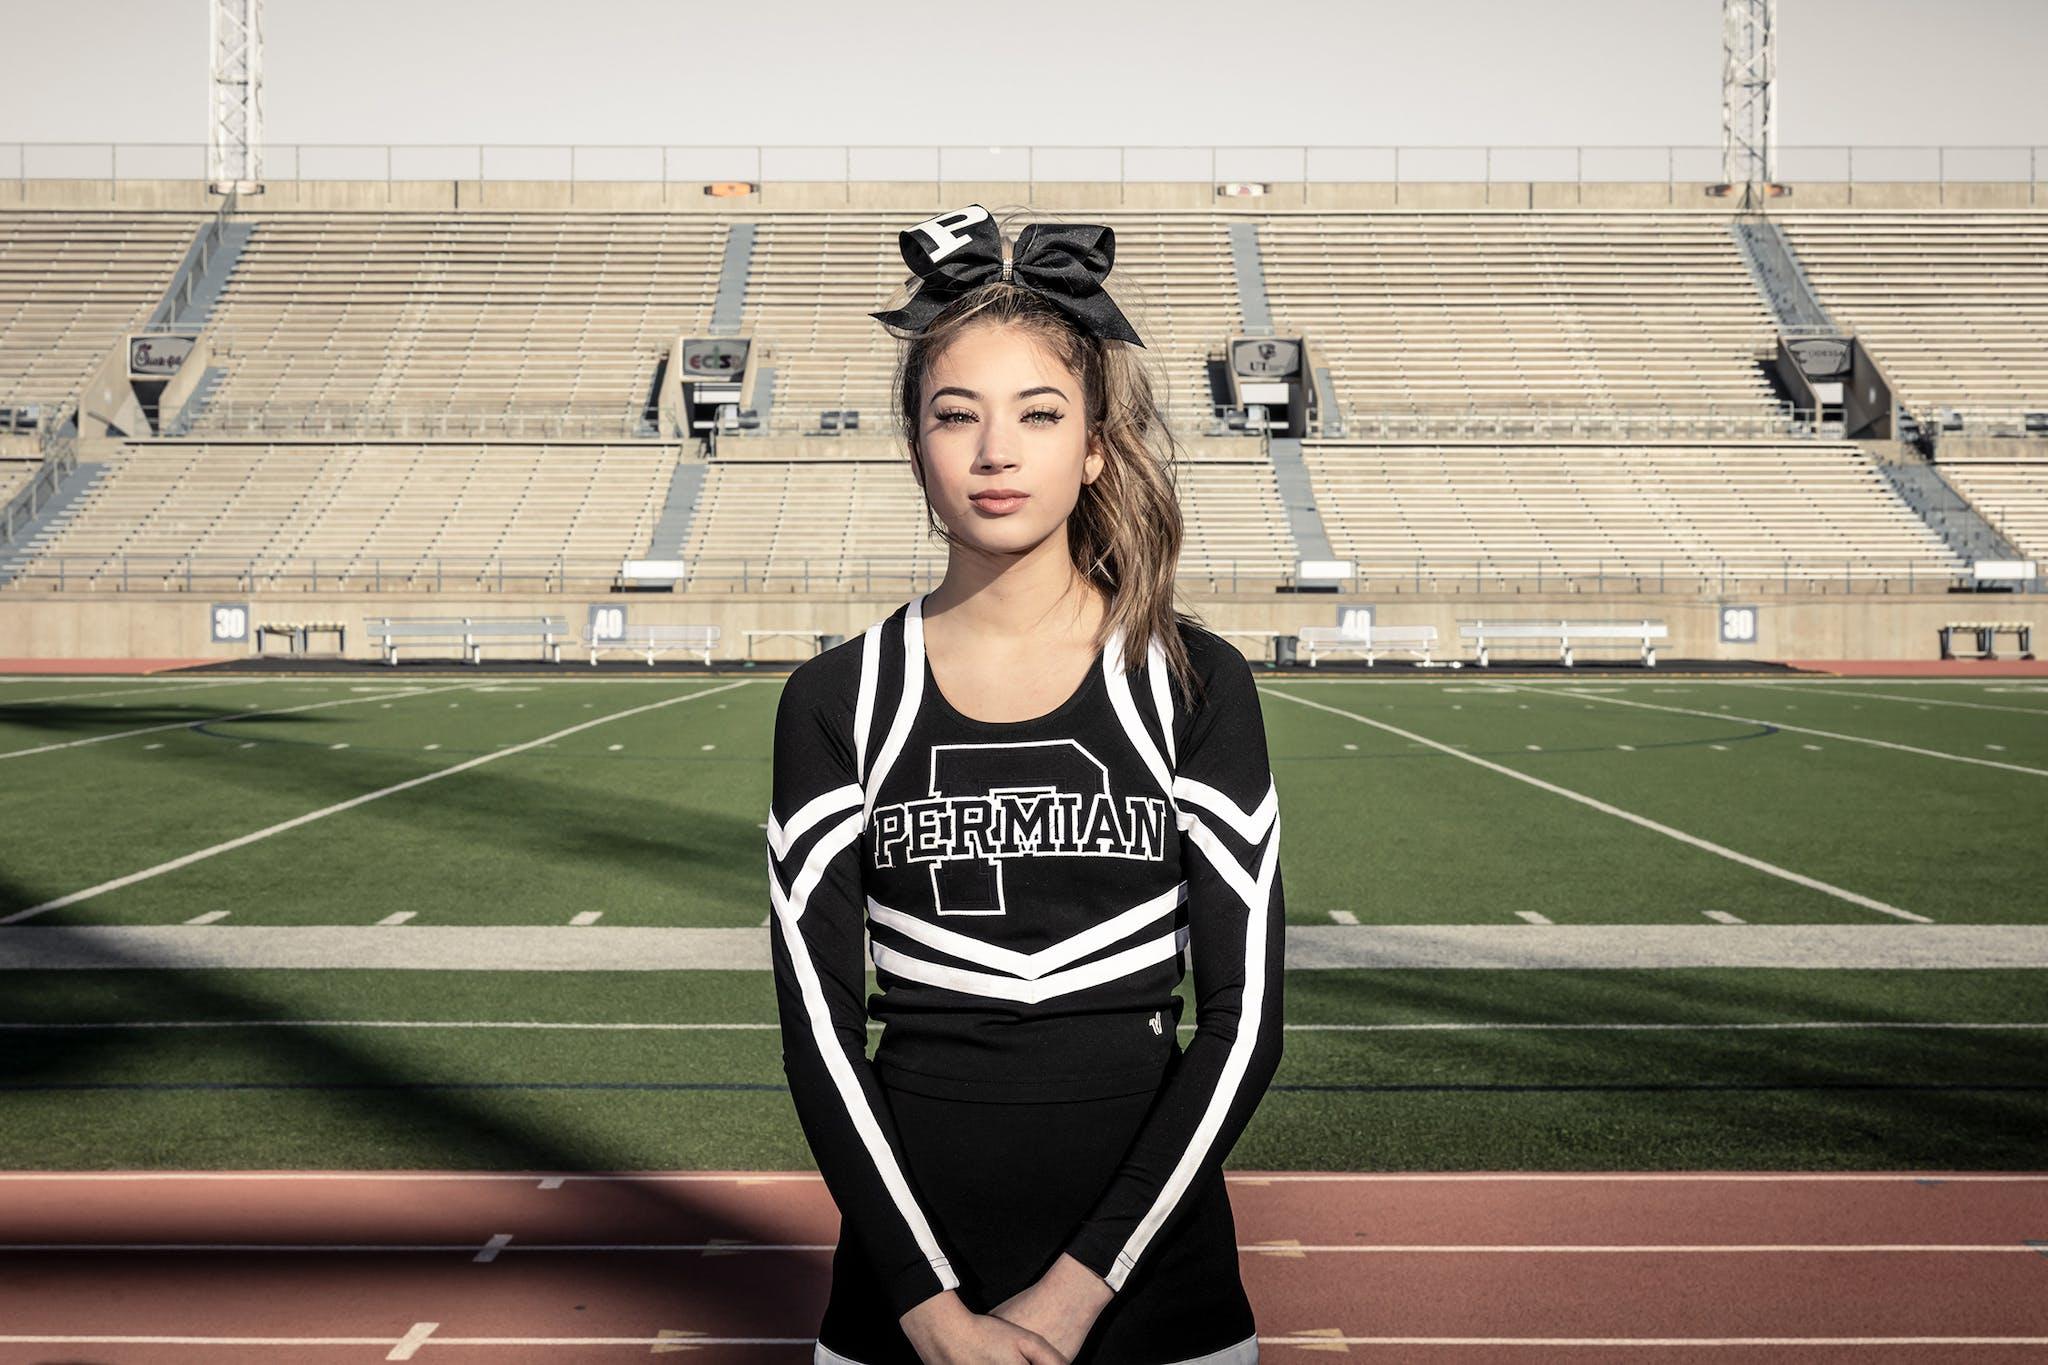 Permian High School cheerleader Isabella Garza, in Odessa.